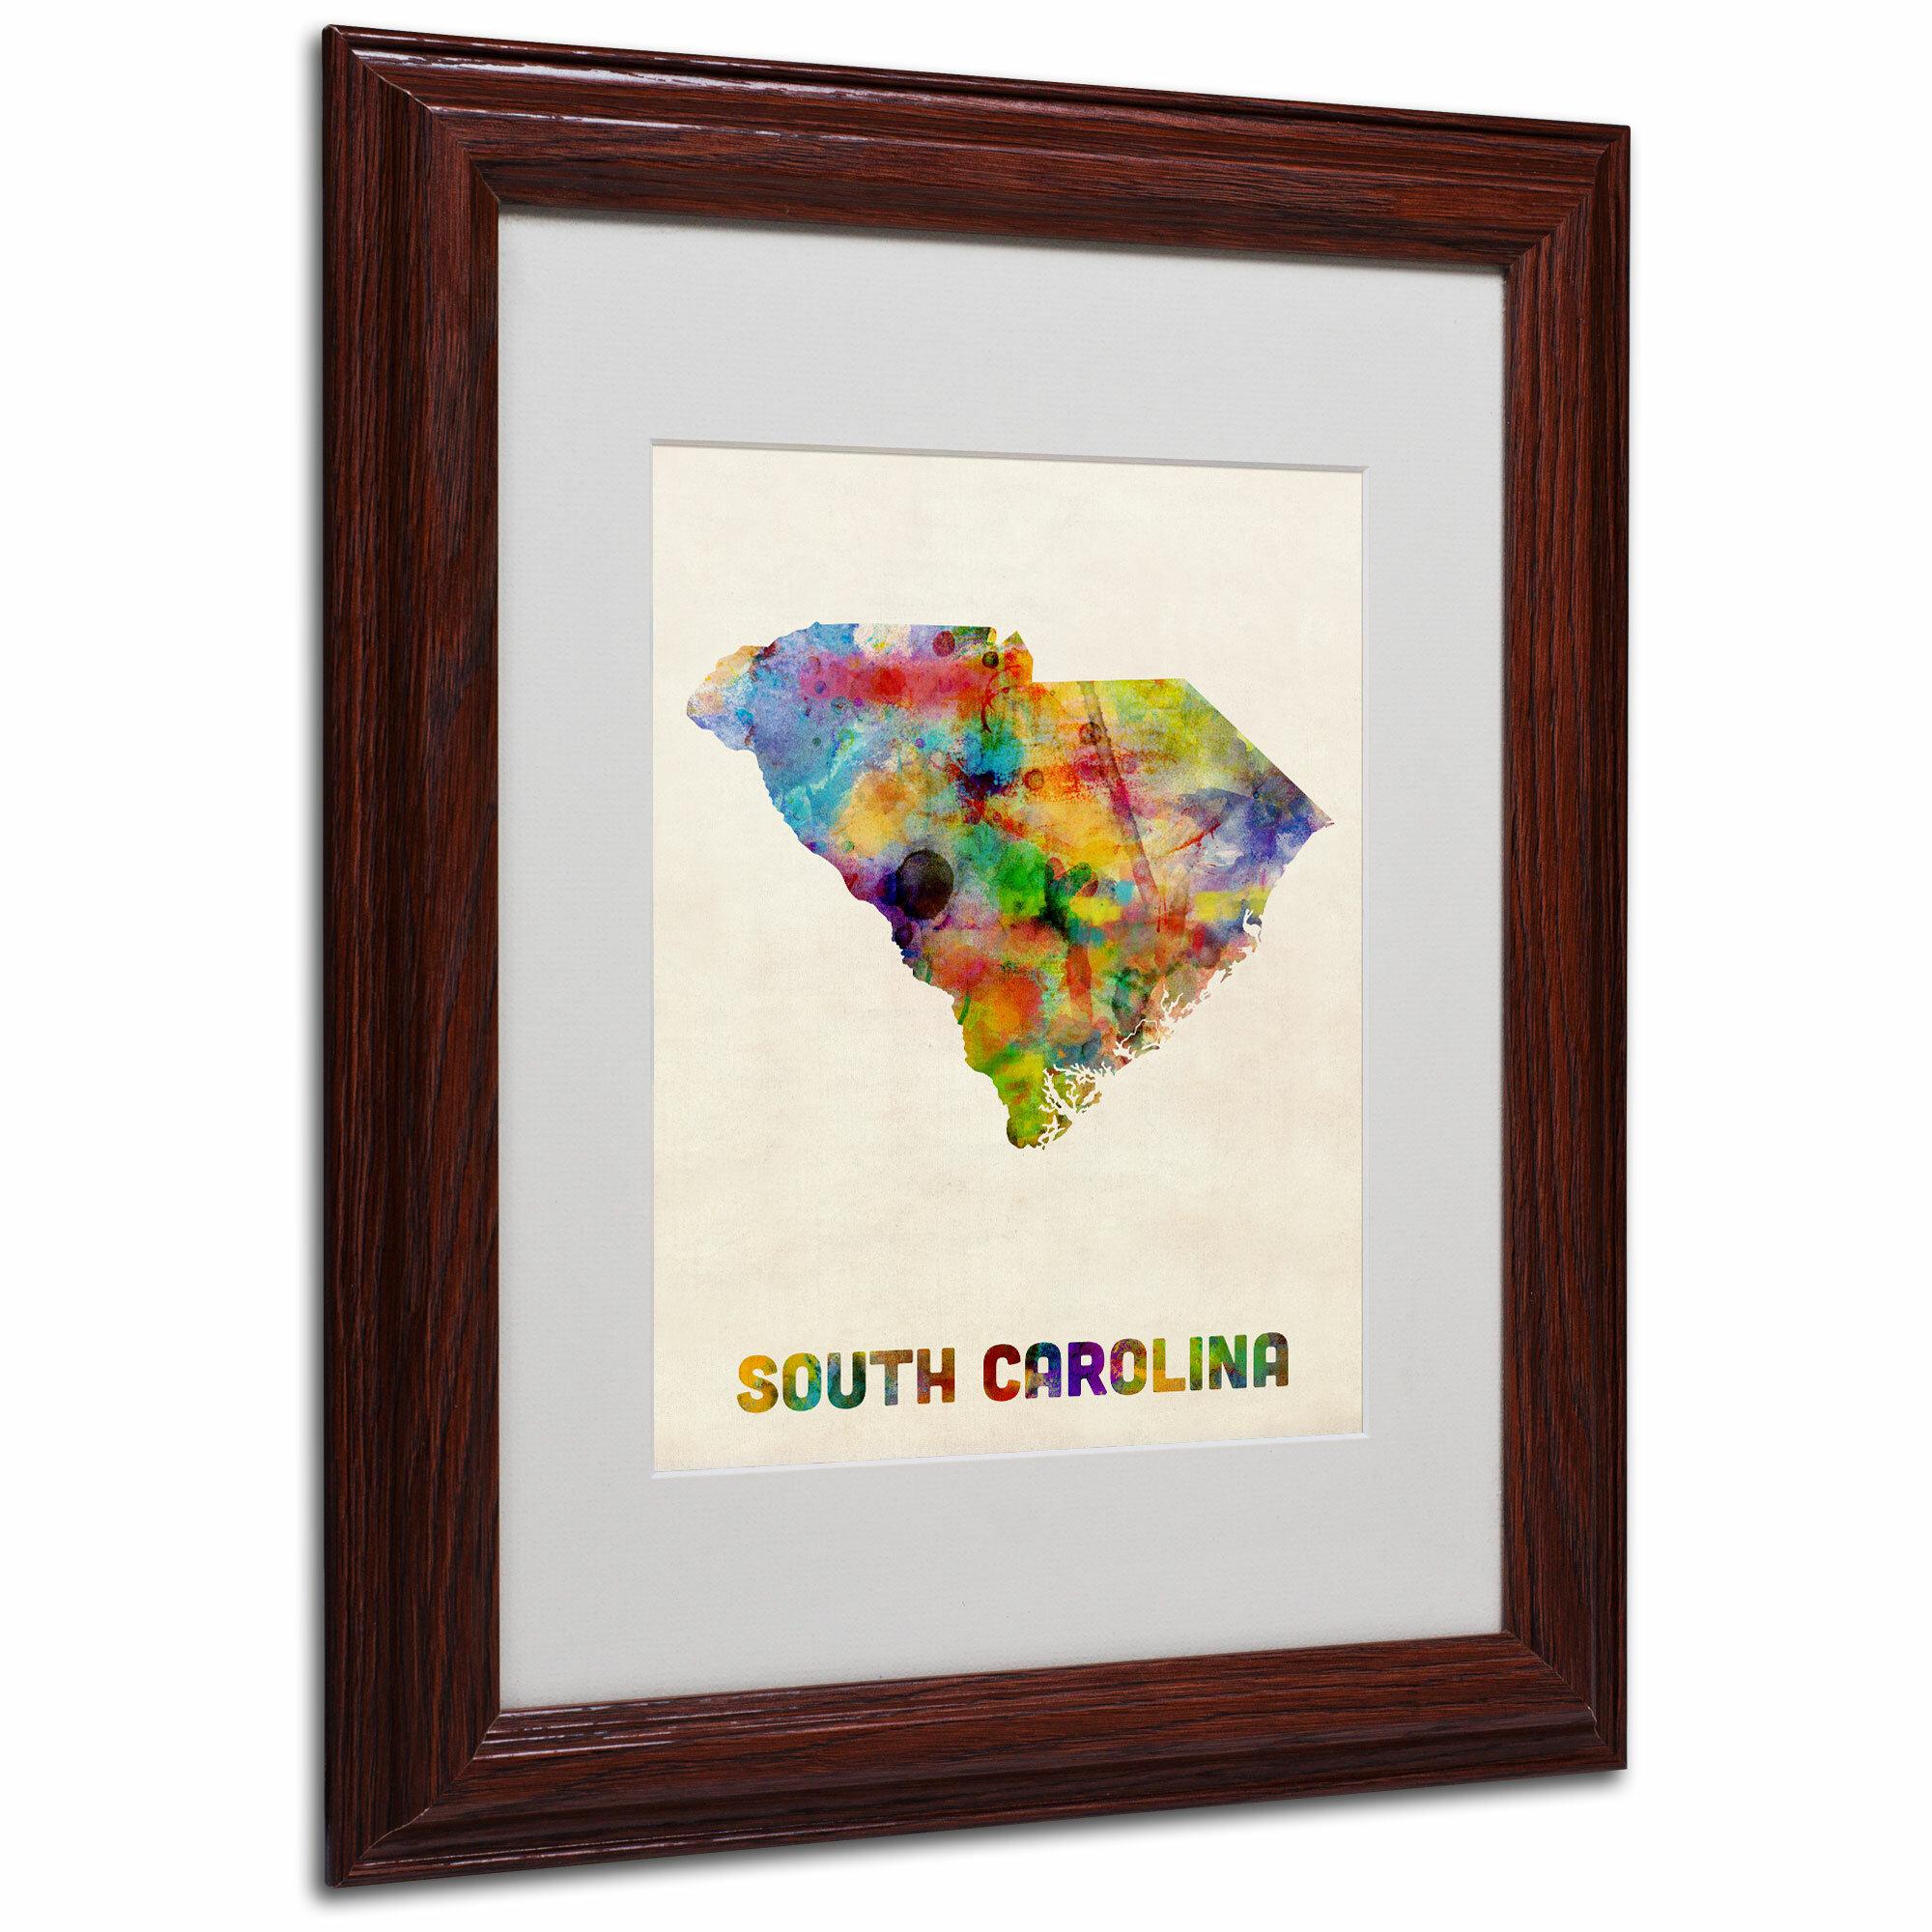 Trademark Art South Carolina Map By Michael Thompsett Framed Graphic Art Wayfair